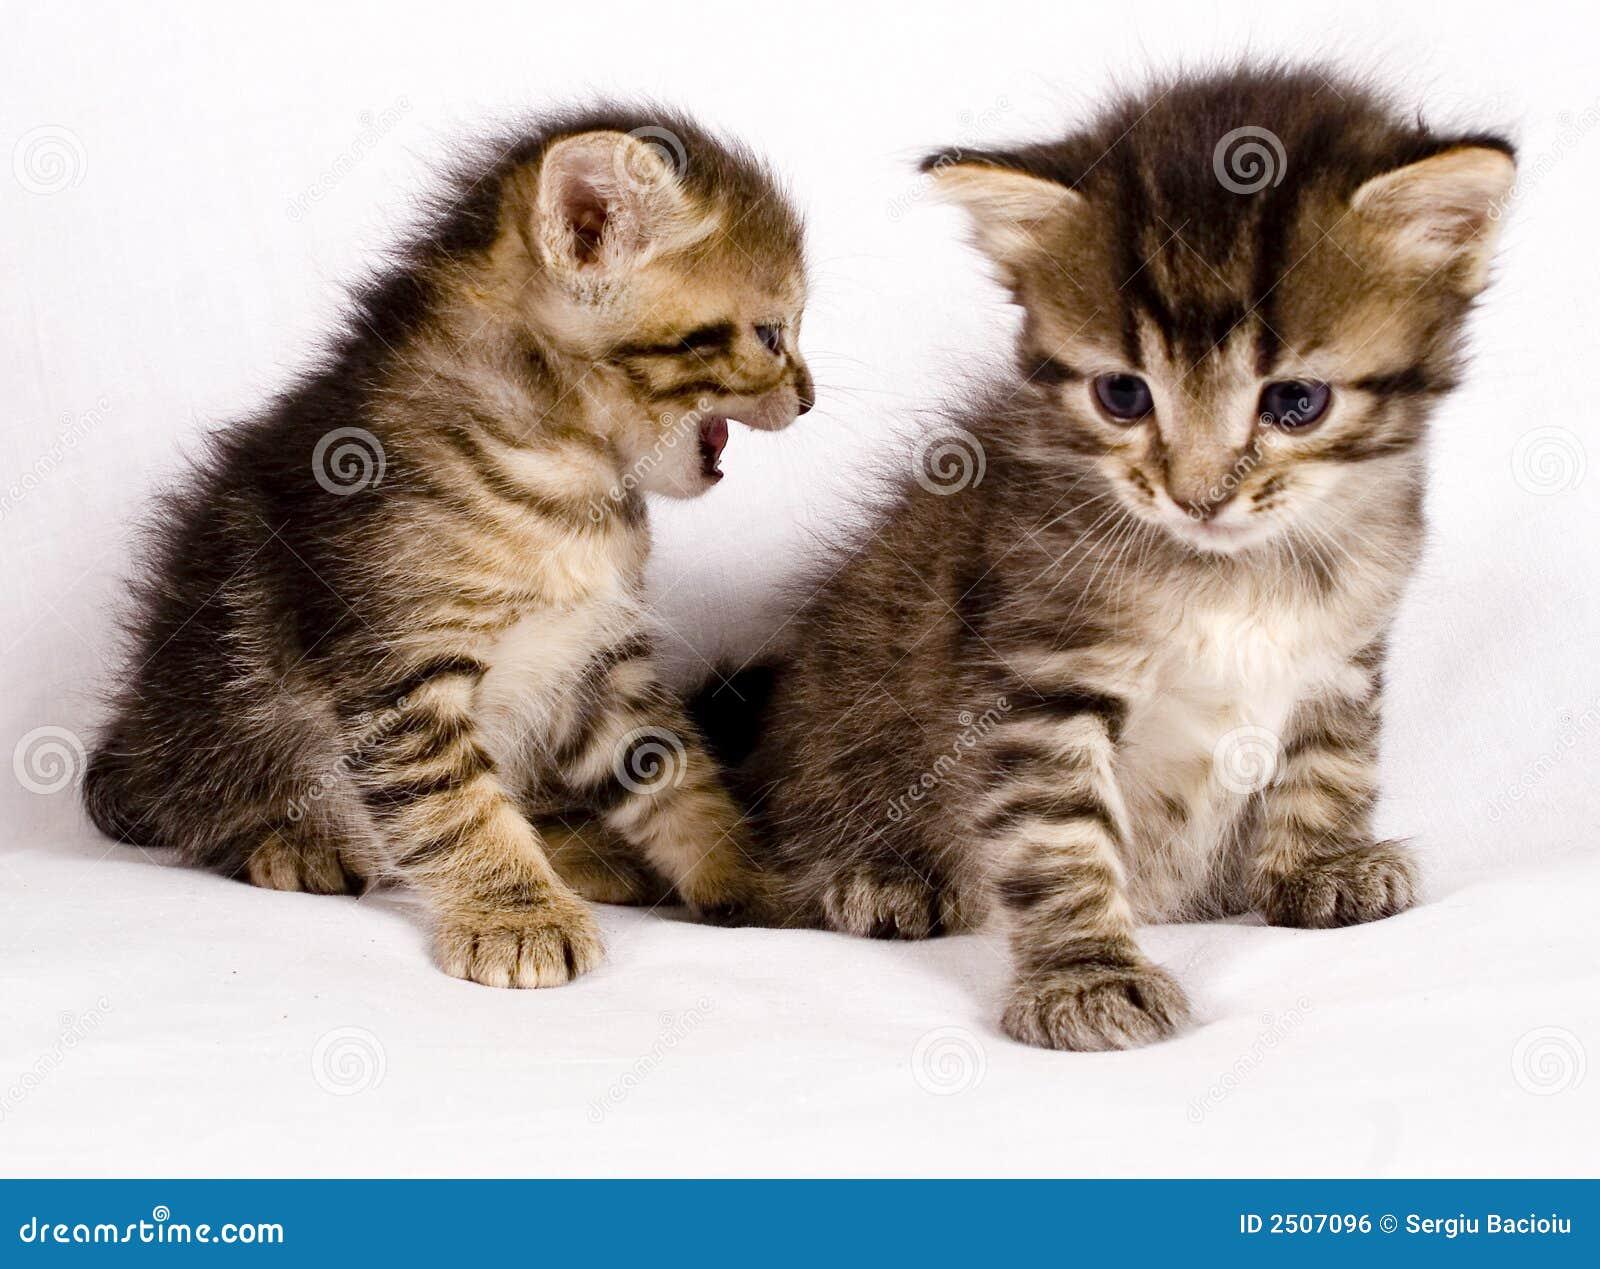 Beach chair beach chair clipart - Cute Cats Royalty Free Stock Image Image 2507096